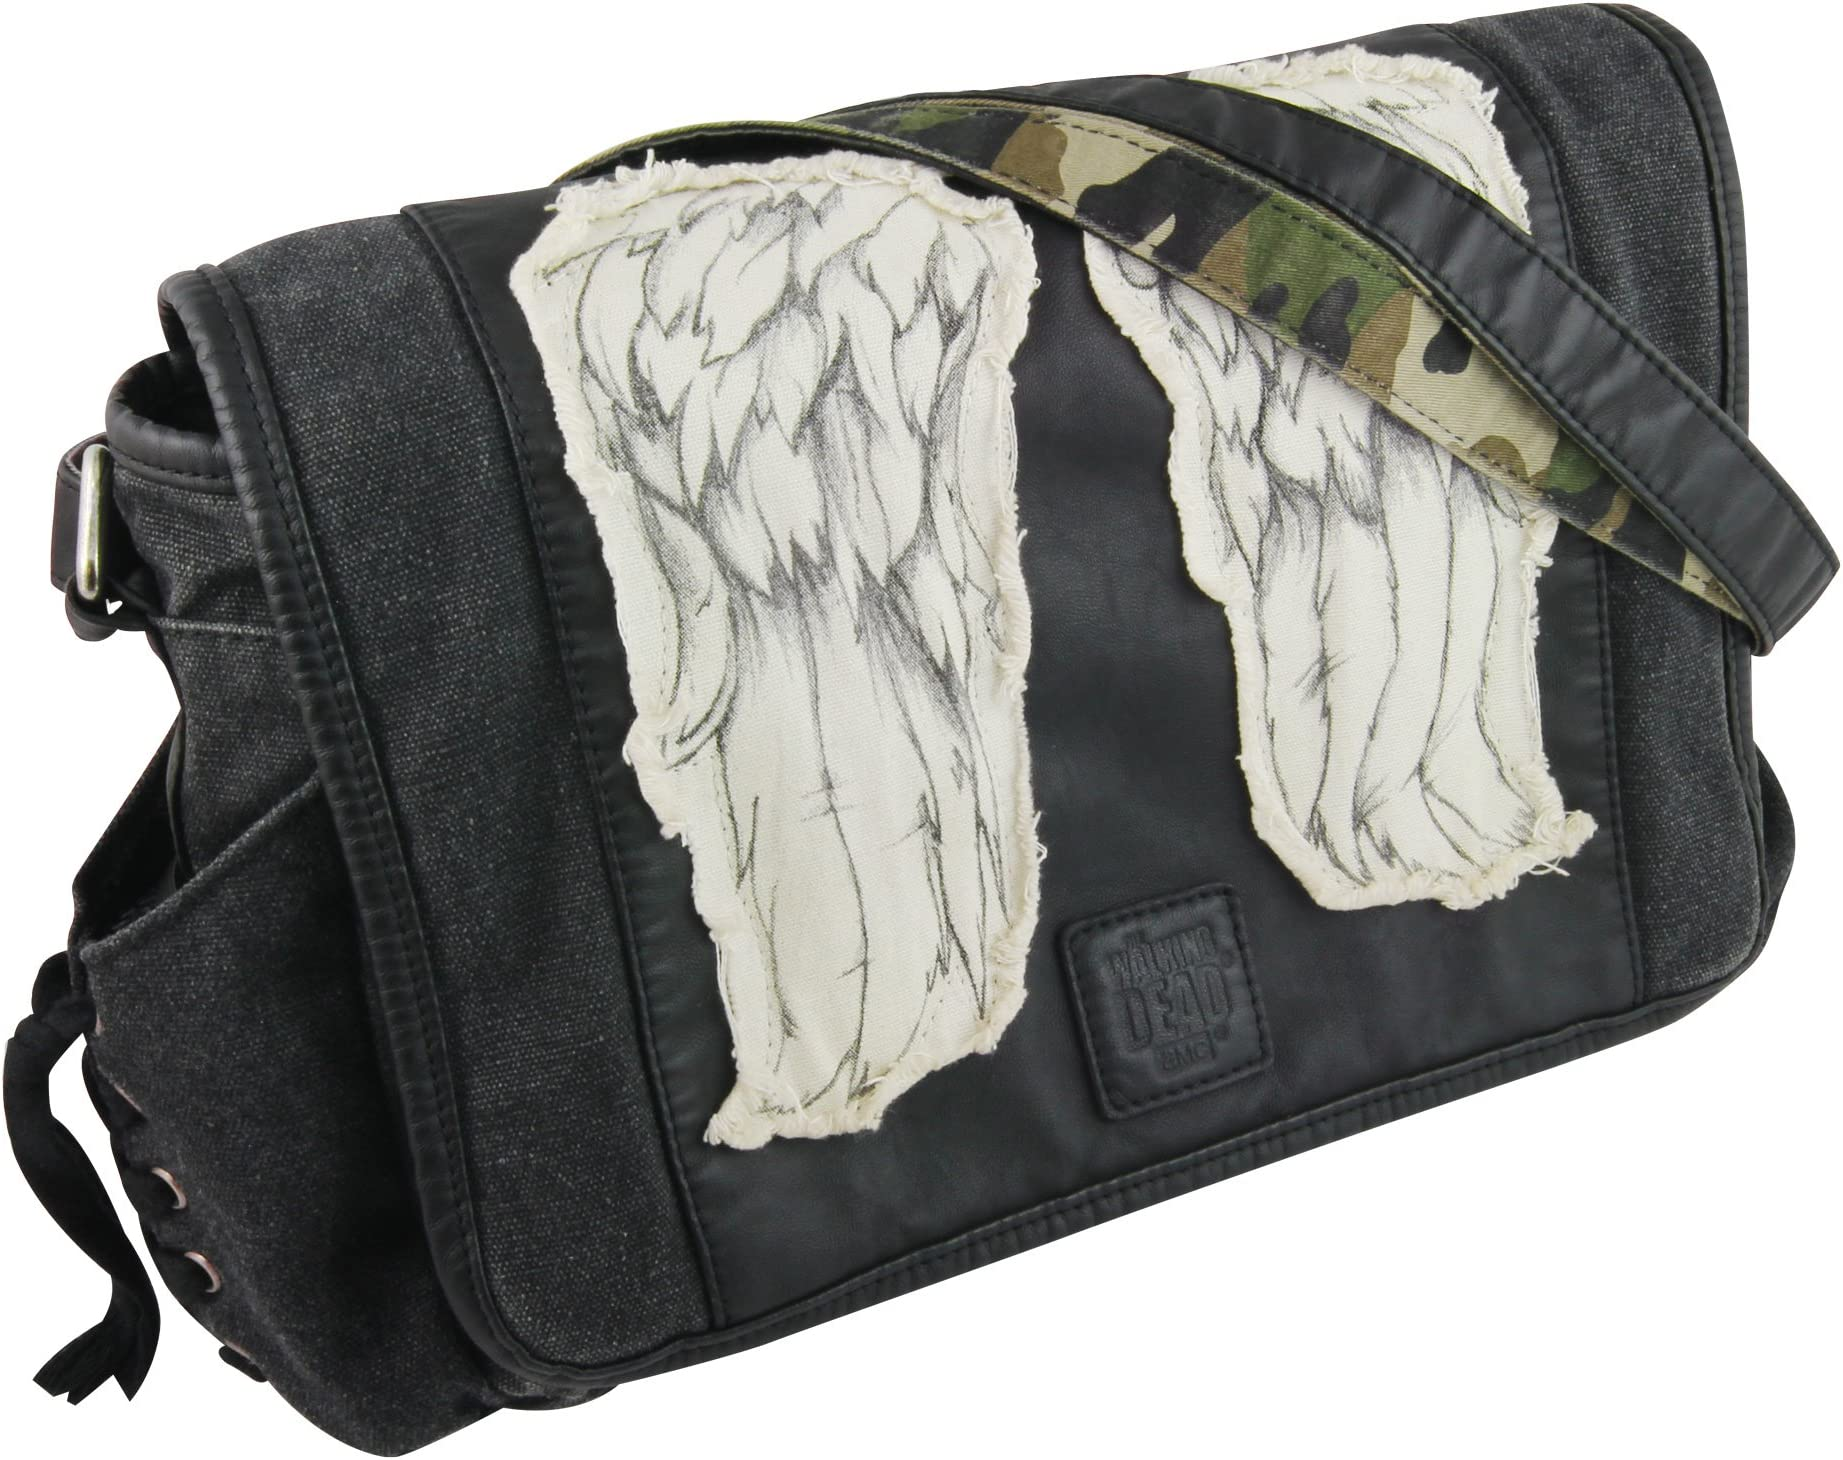 Jual Murah Osprey Flap Jill Mini Messenger Bag Black Free Uk Giordano Jam Tangan Pria Silver Stainless Steel P158 22 The Walking Dead Daryl Wings Delivery Image